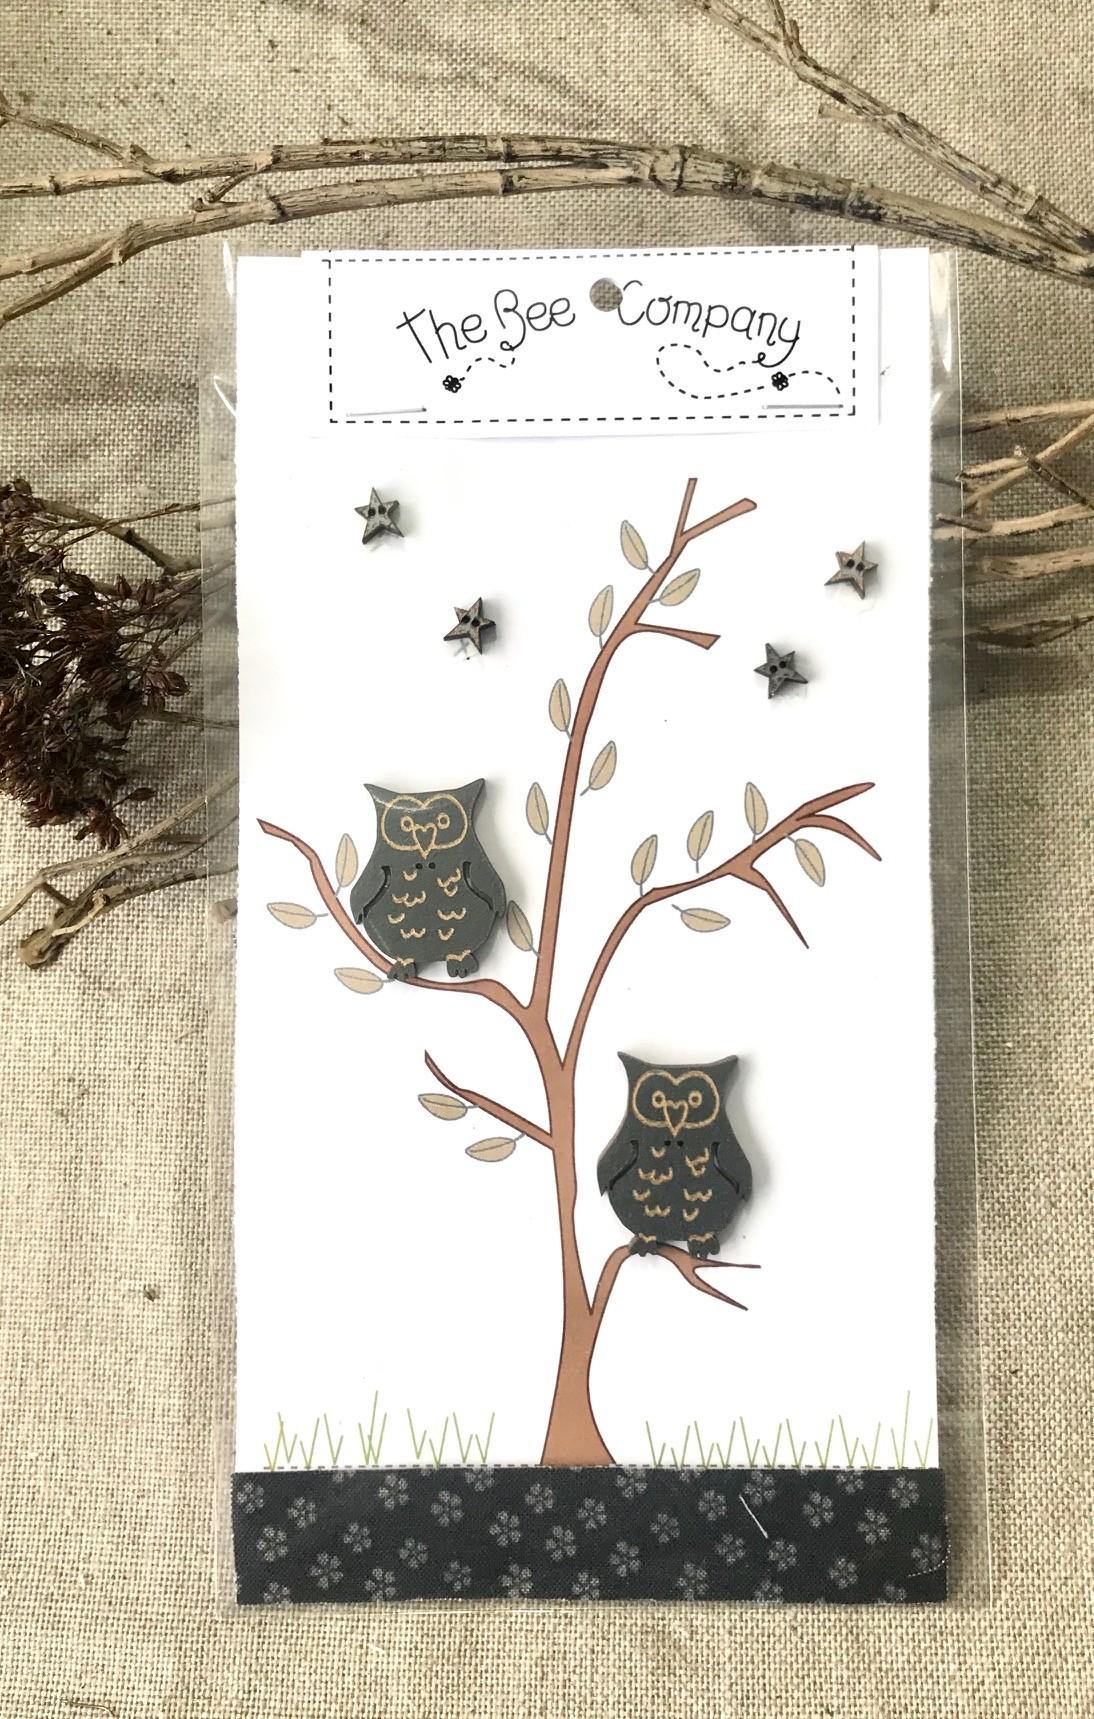 Buttons - Owls & stars TB5P